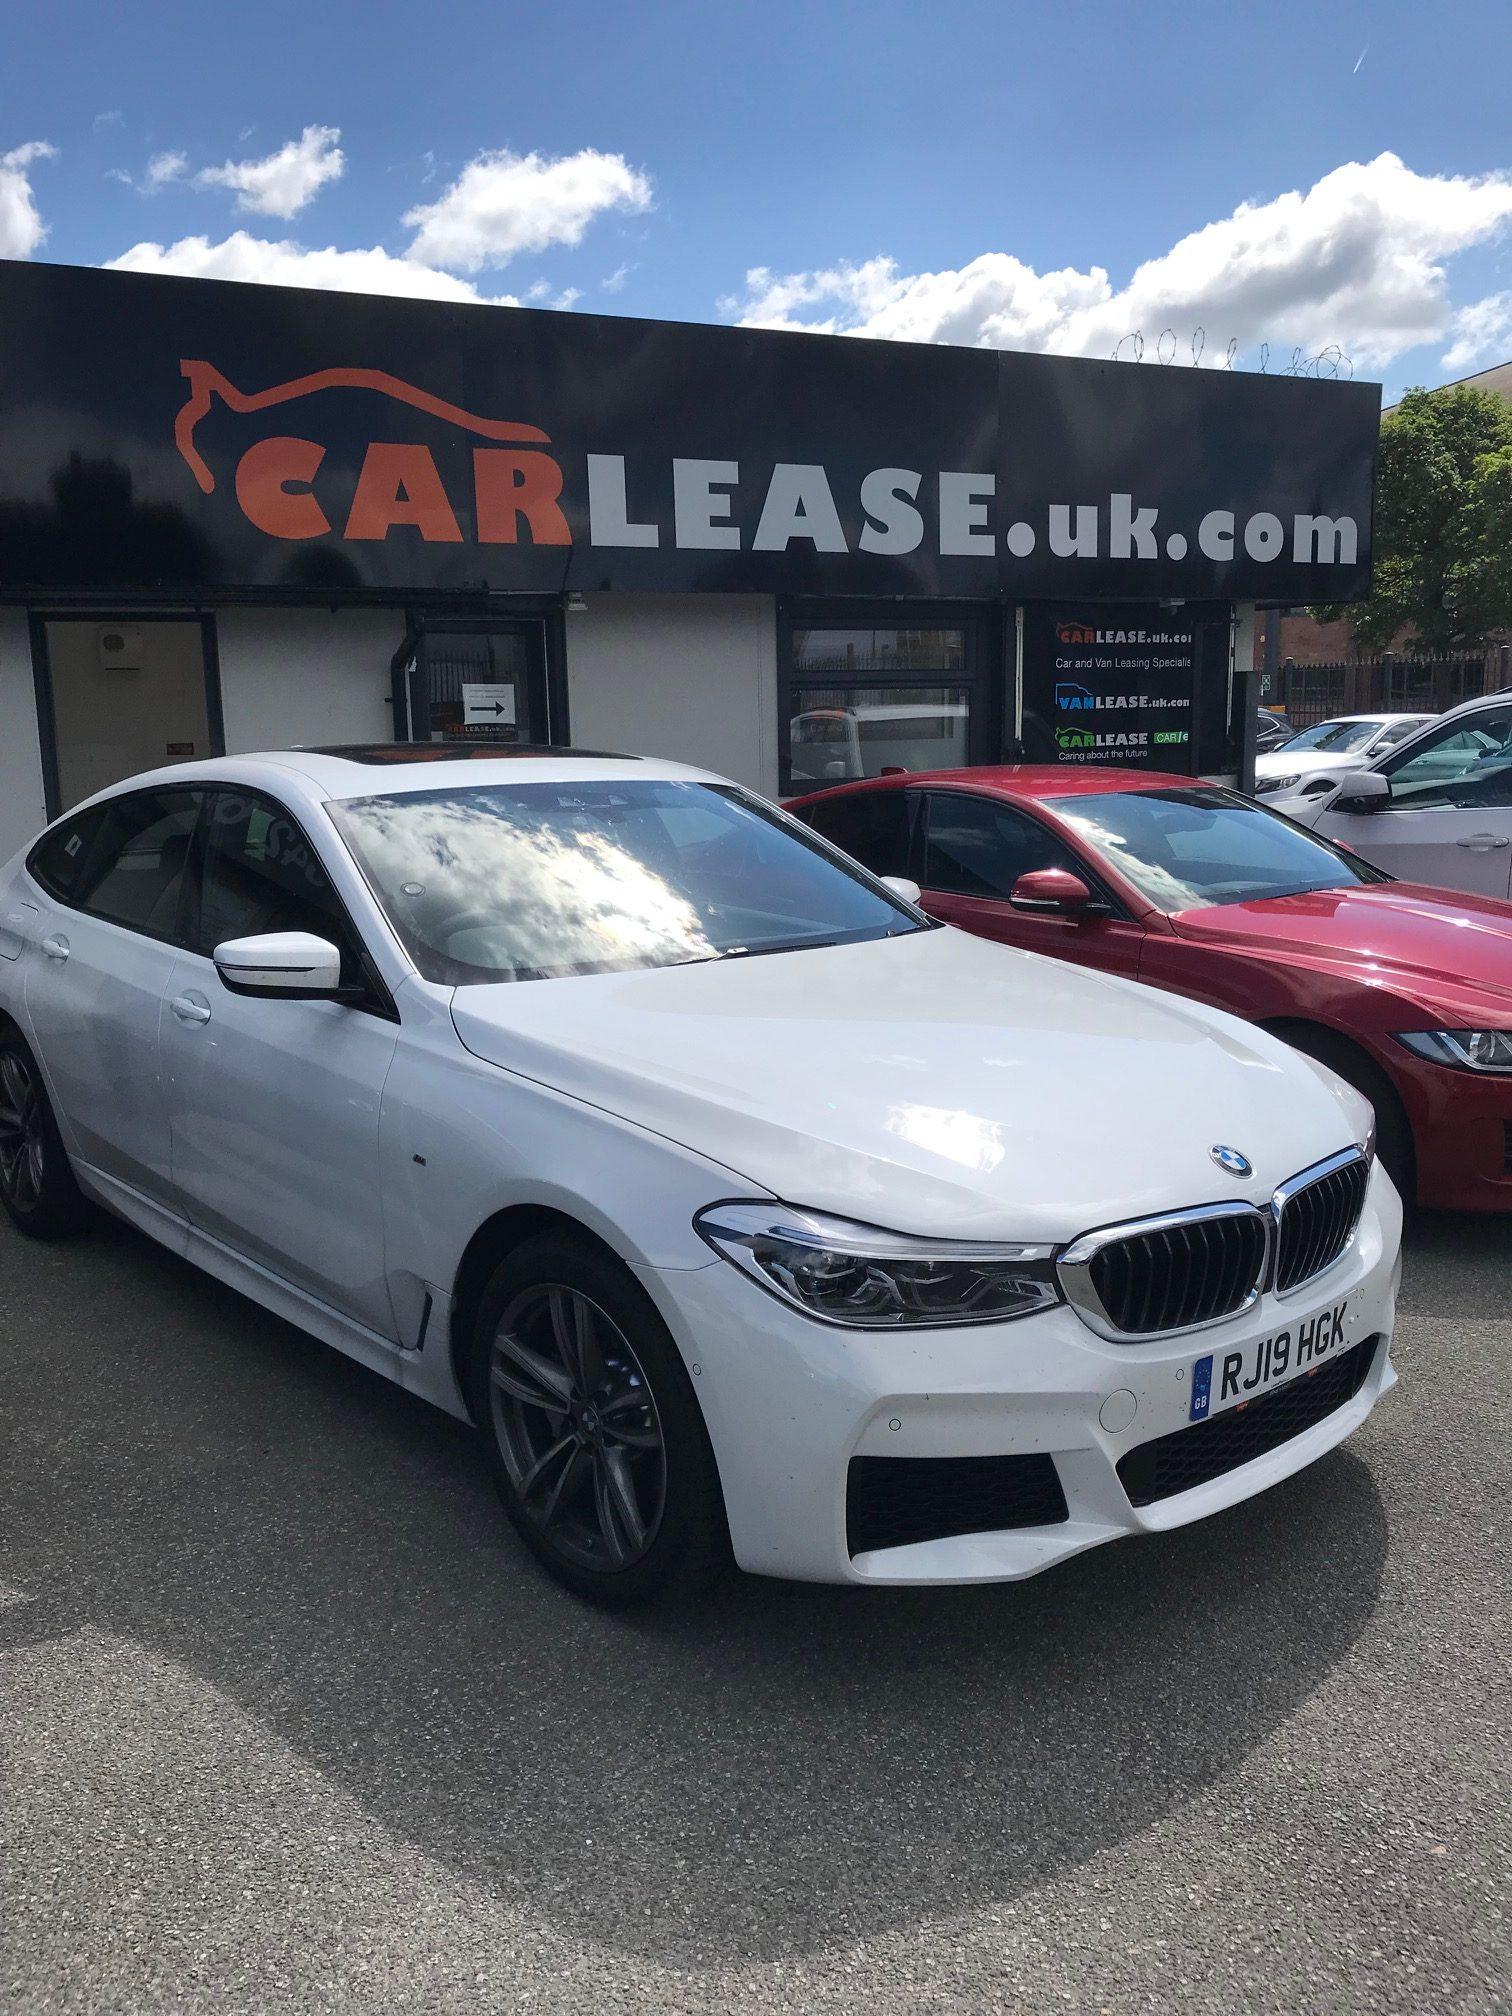 BMW 6 SERIES GRAN TURISMO DIESEL HATCHBACK 620d M Sport 5dr Auto Car Leasing Best Deals